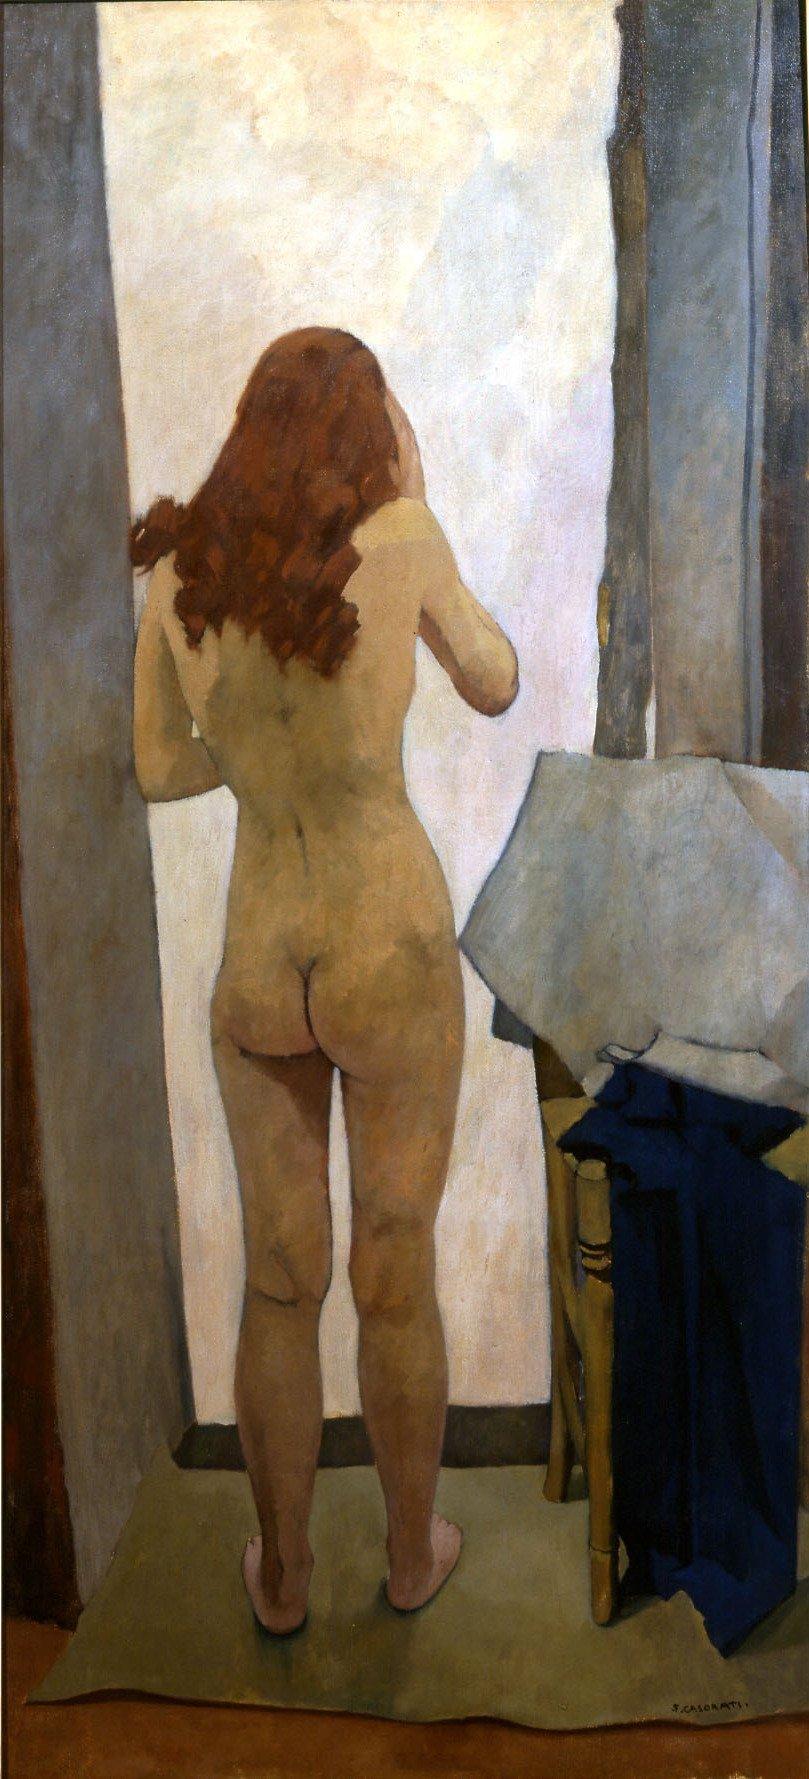 Casorati, Nudo di schiena, 1939, 160x74 cm